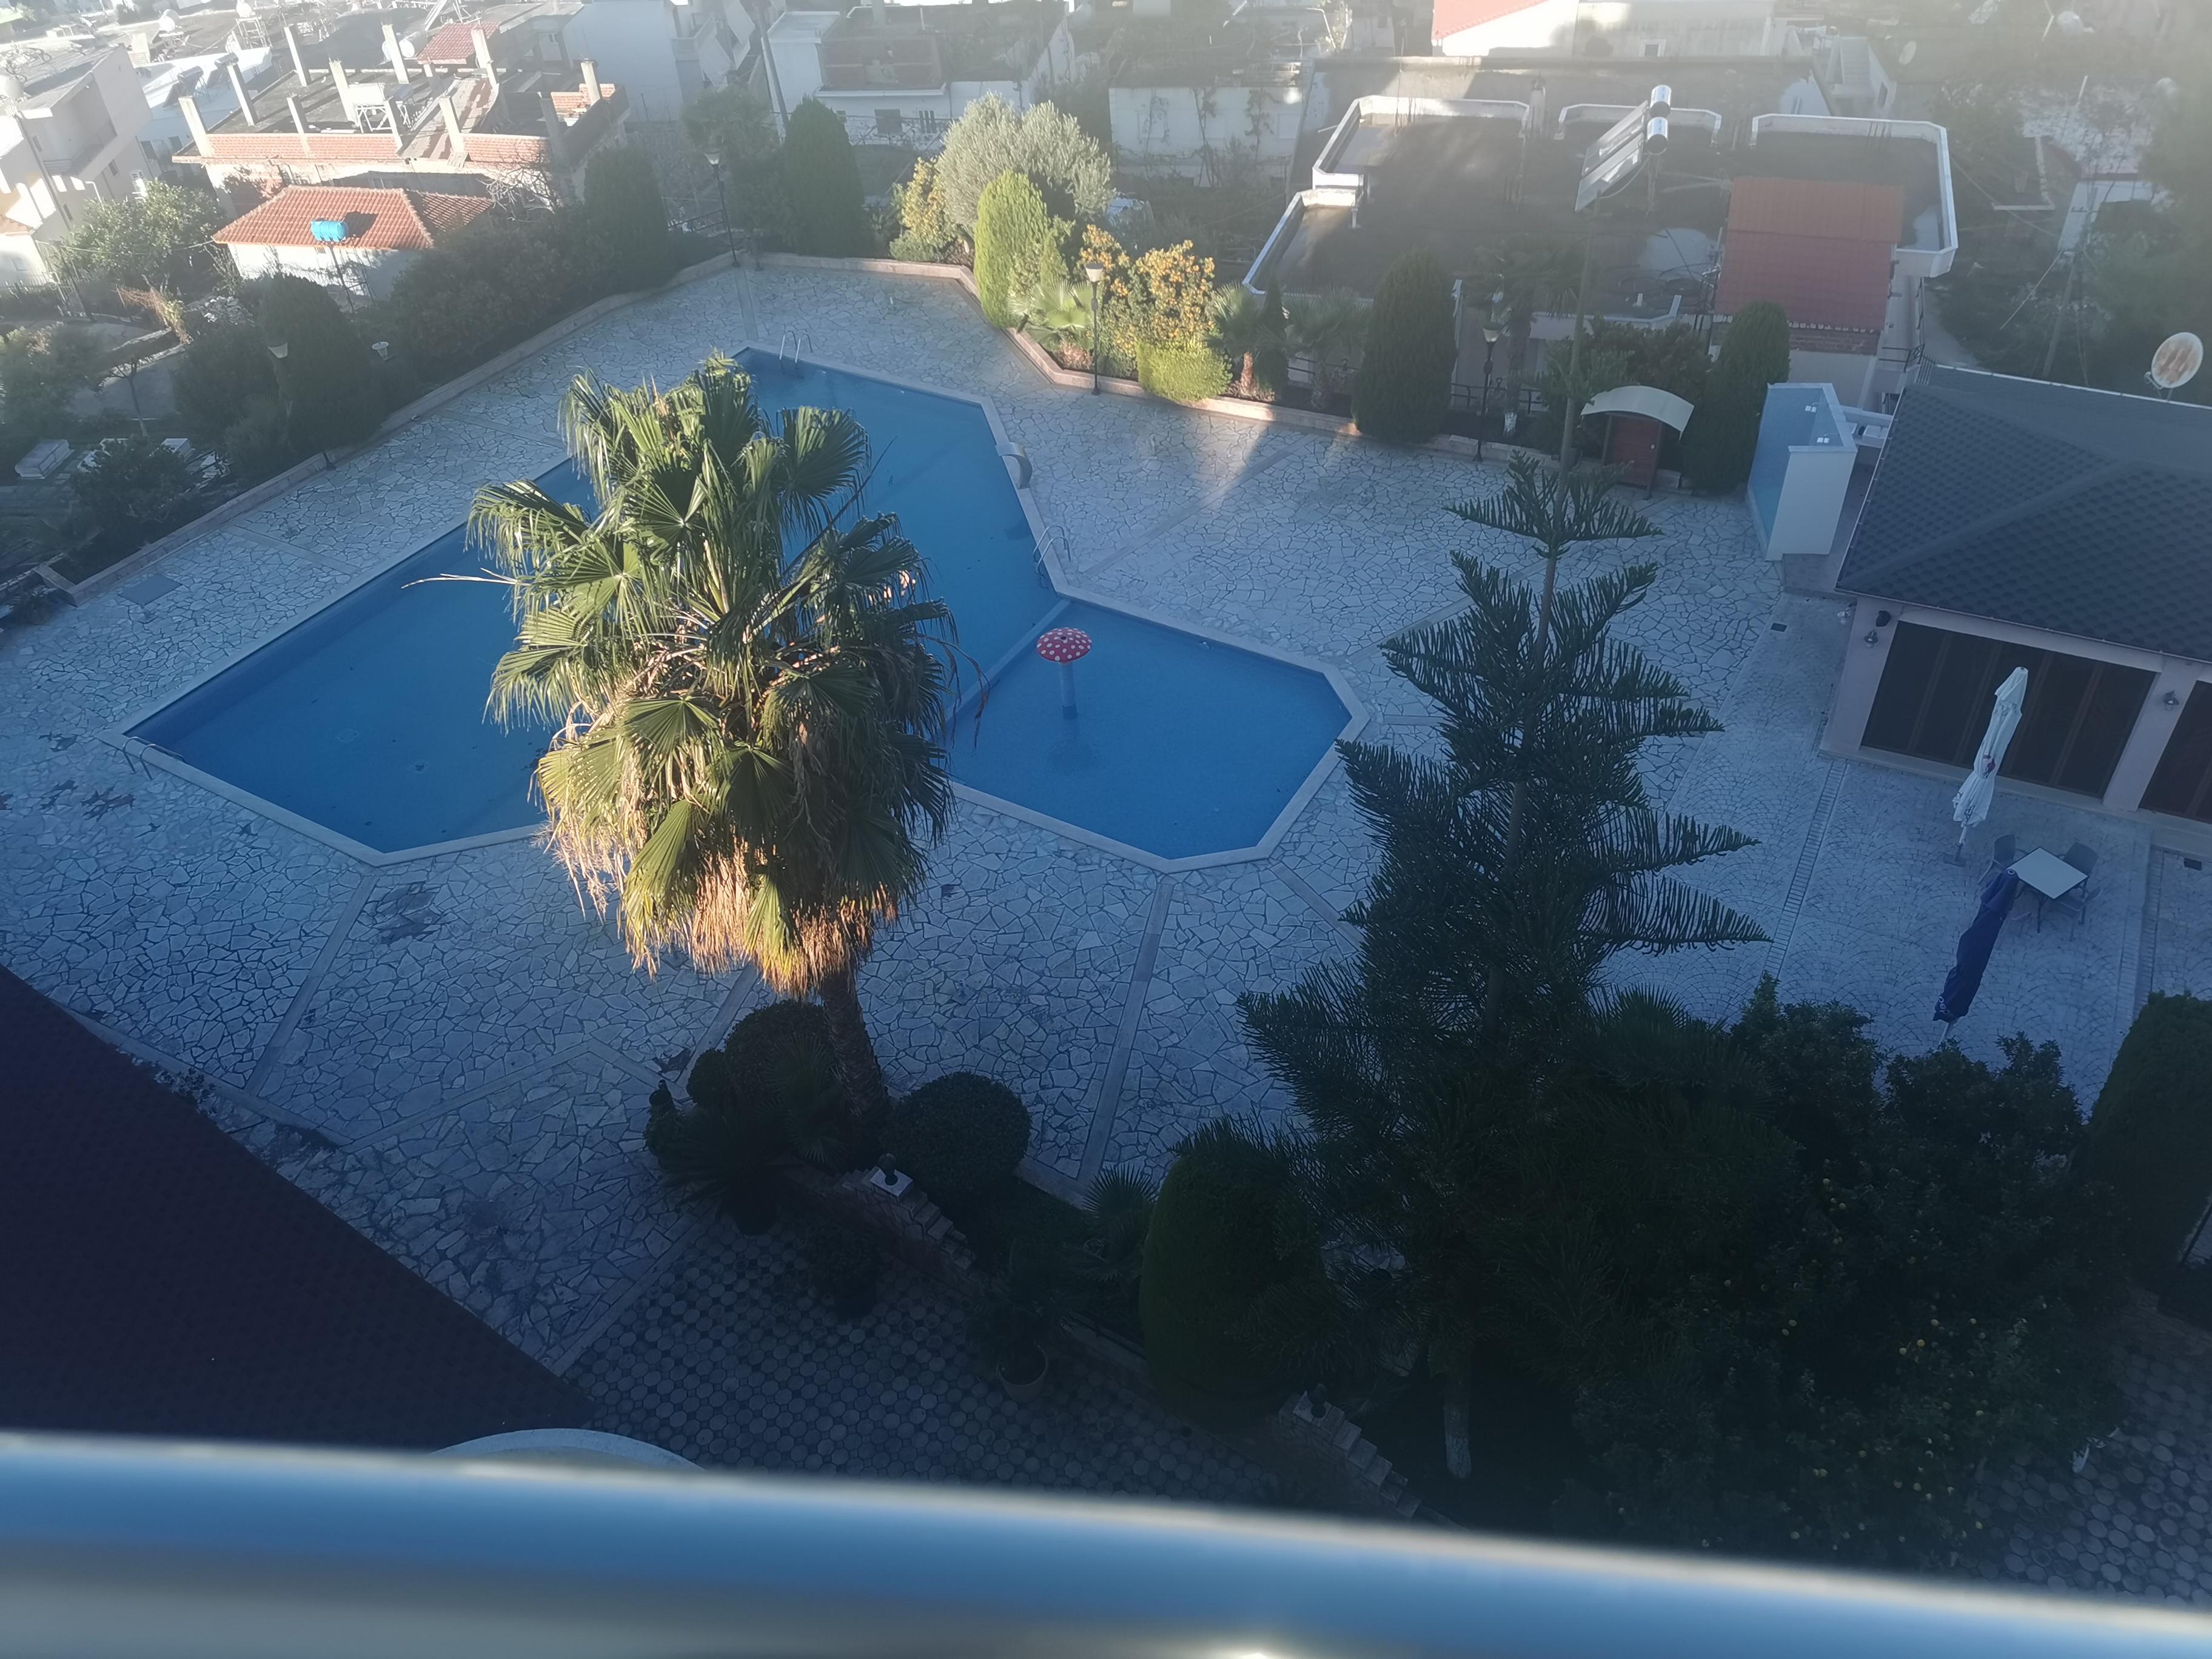 Letovanje Albanija autobusom, Saranda, hotel Mediterrane,pogled na bazen